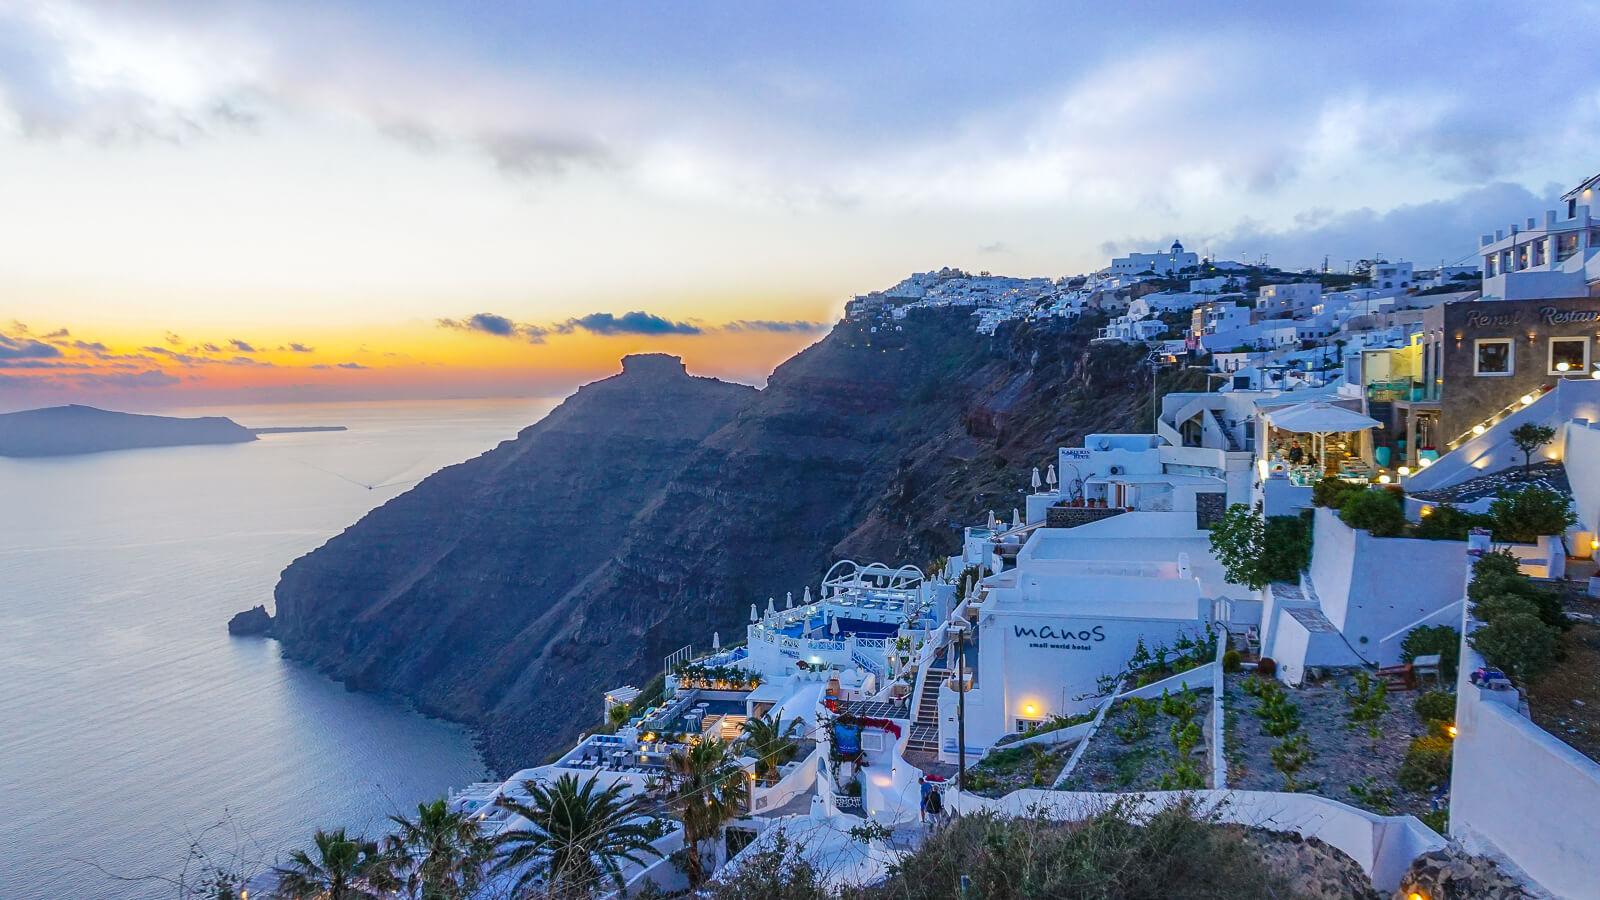 Santorinis: ekskursija iš Kretos dviem dienoms